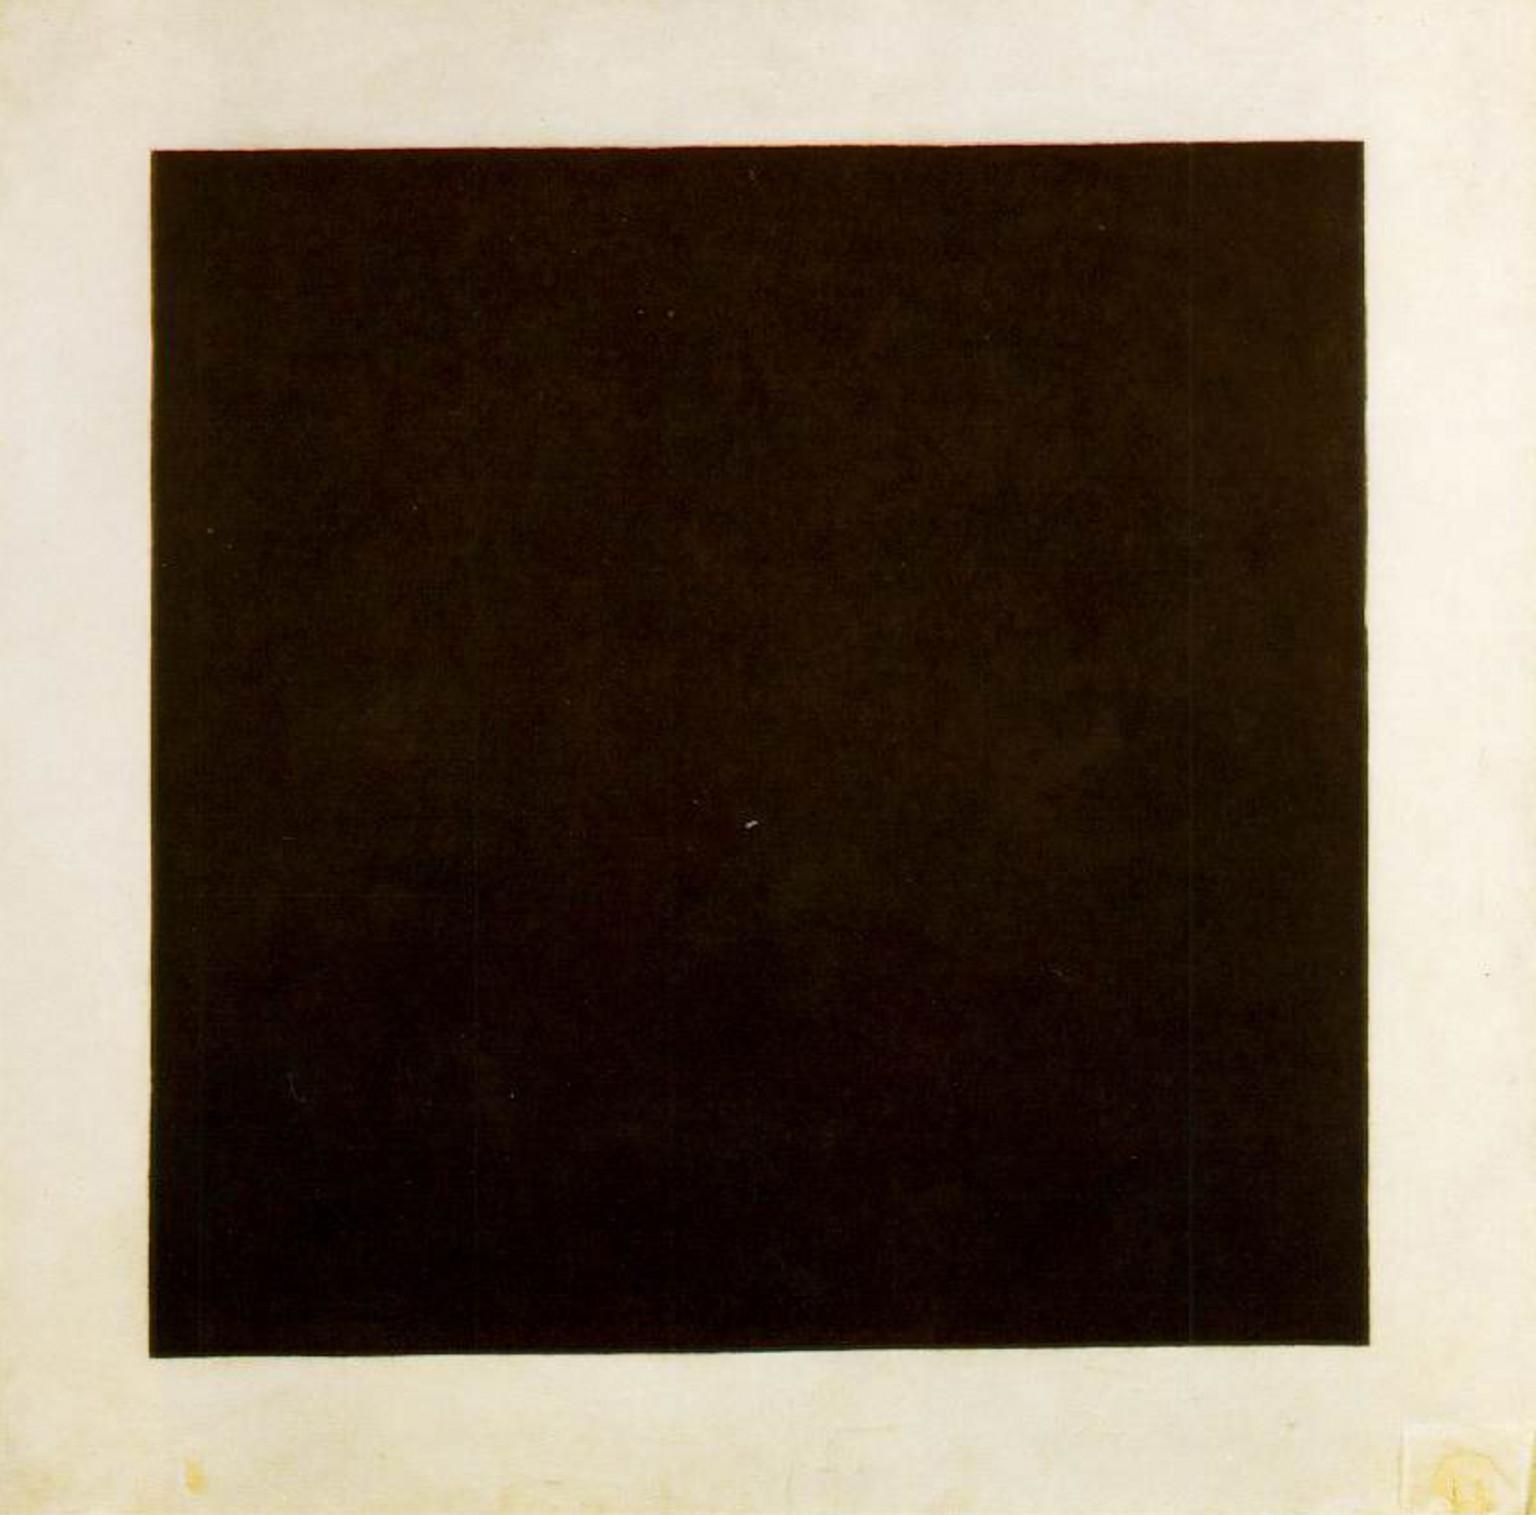 Kasimir Malevich's  Black Square